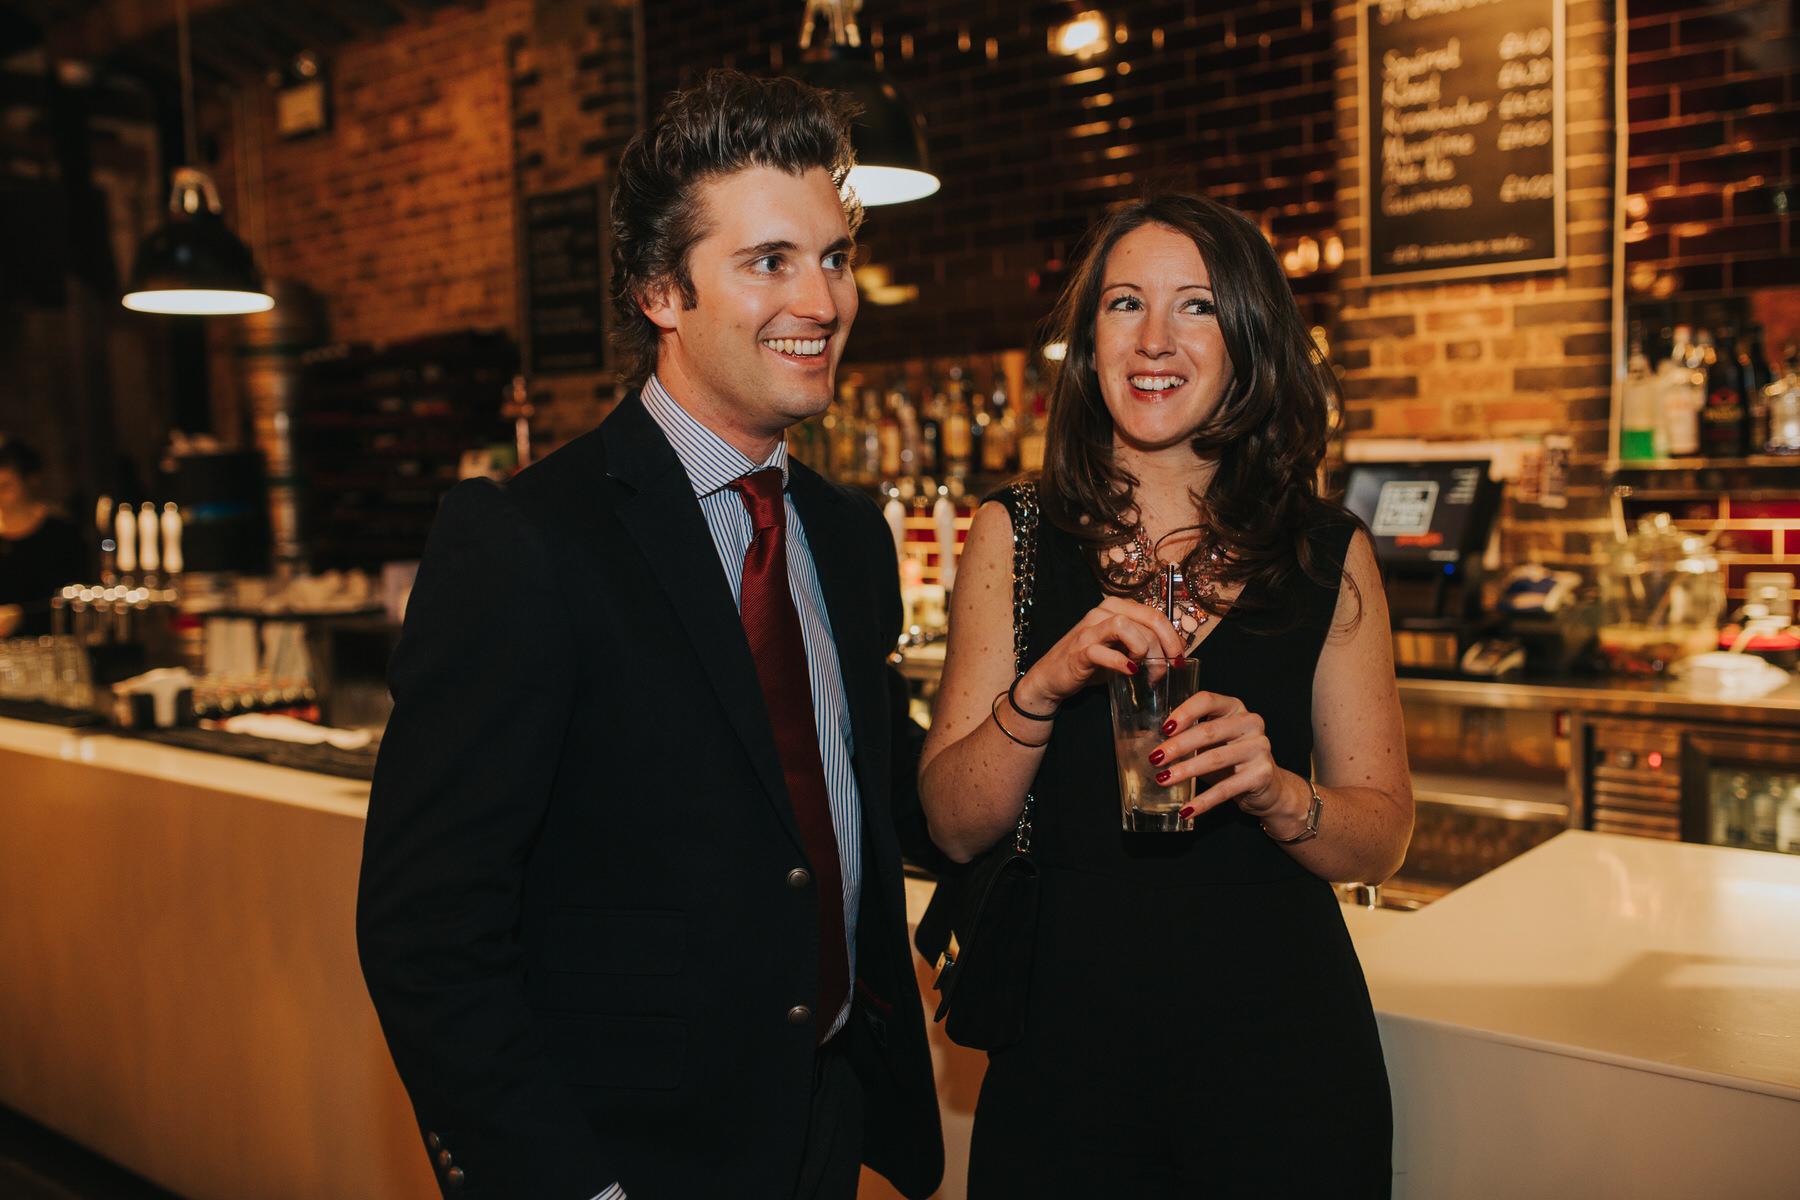 162-St Chads Place couple enjoying cocktails bar LOndon event.jpg